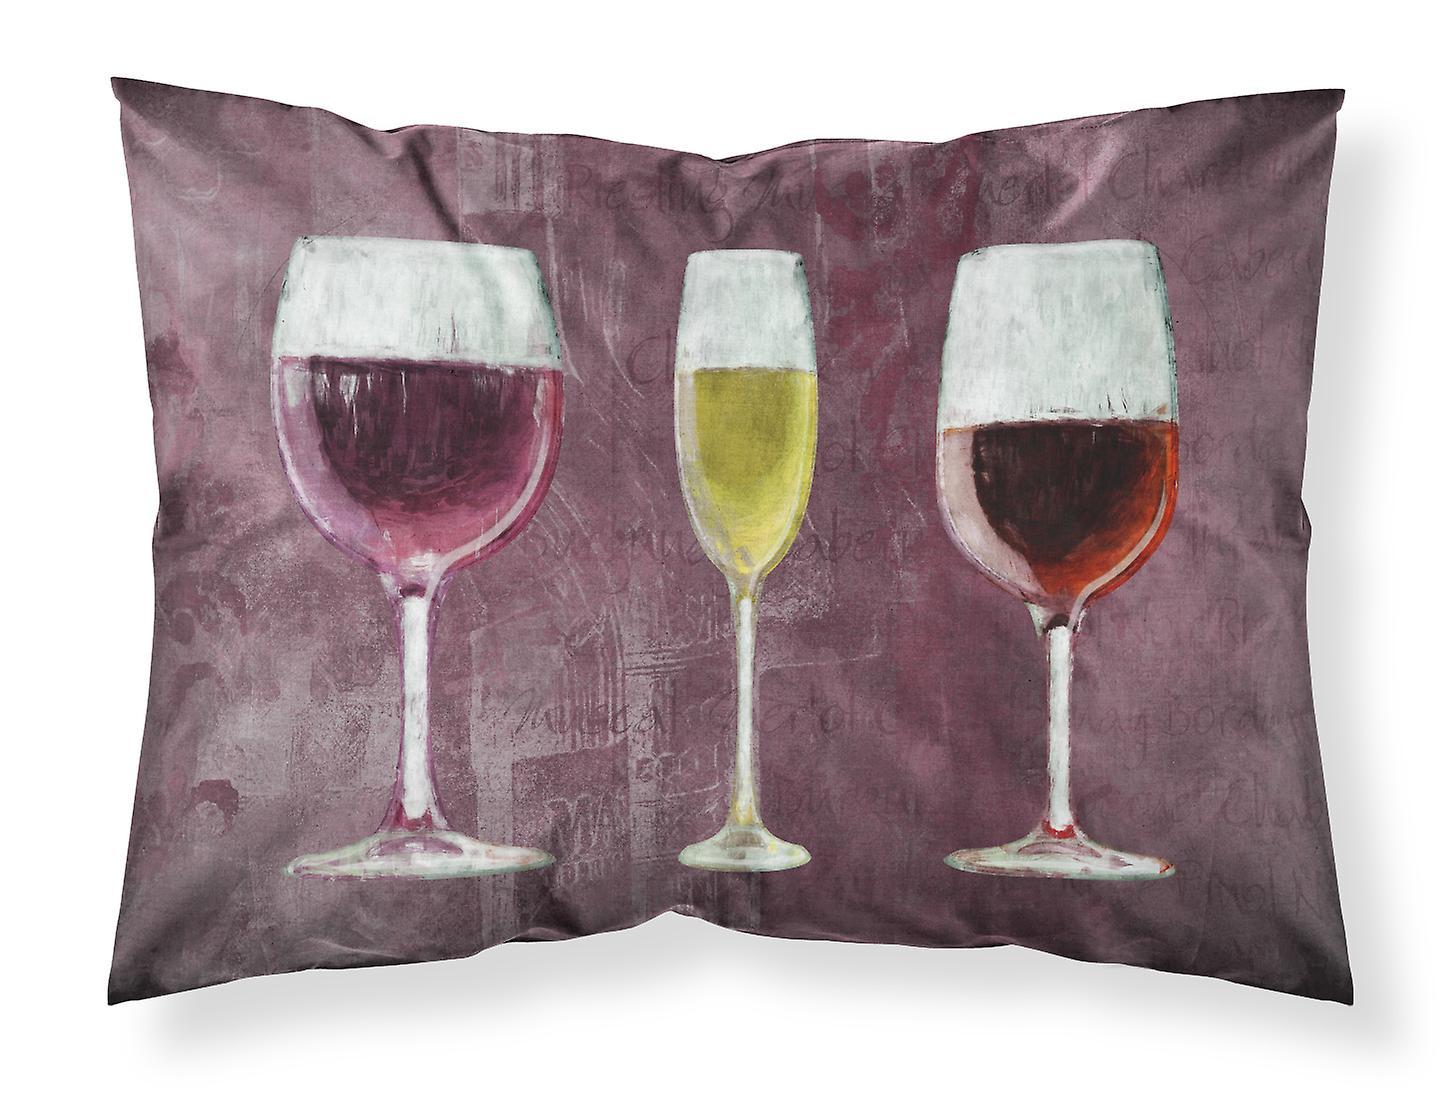 Trois Humidité De Tissu Taie Standard Pourpre D'oreiller Vin Wicking Verres WEHYeb29ID